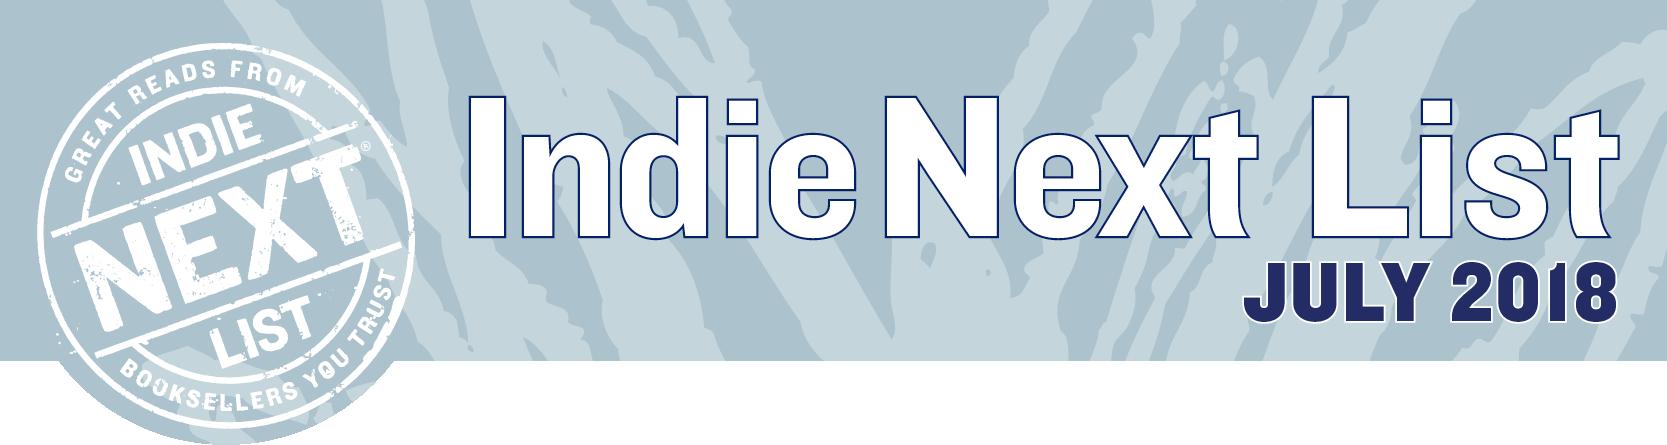 July 2018 Indie Next List Header Image